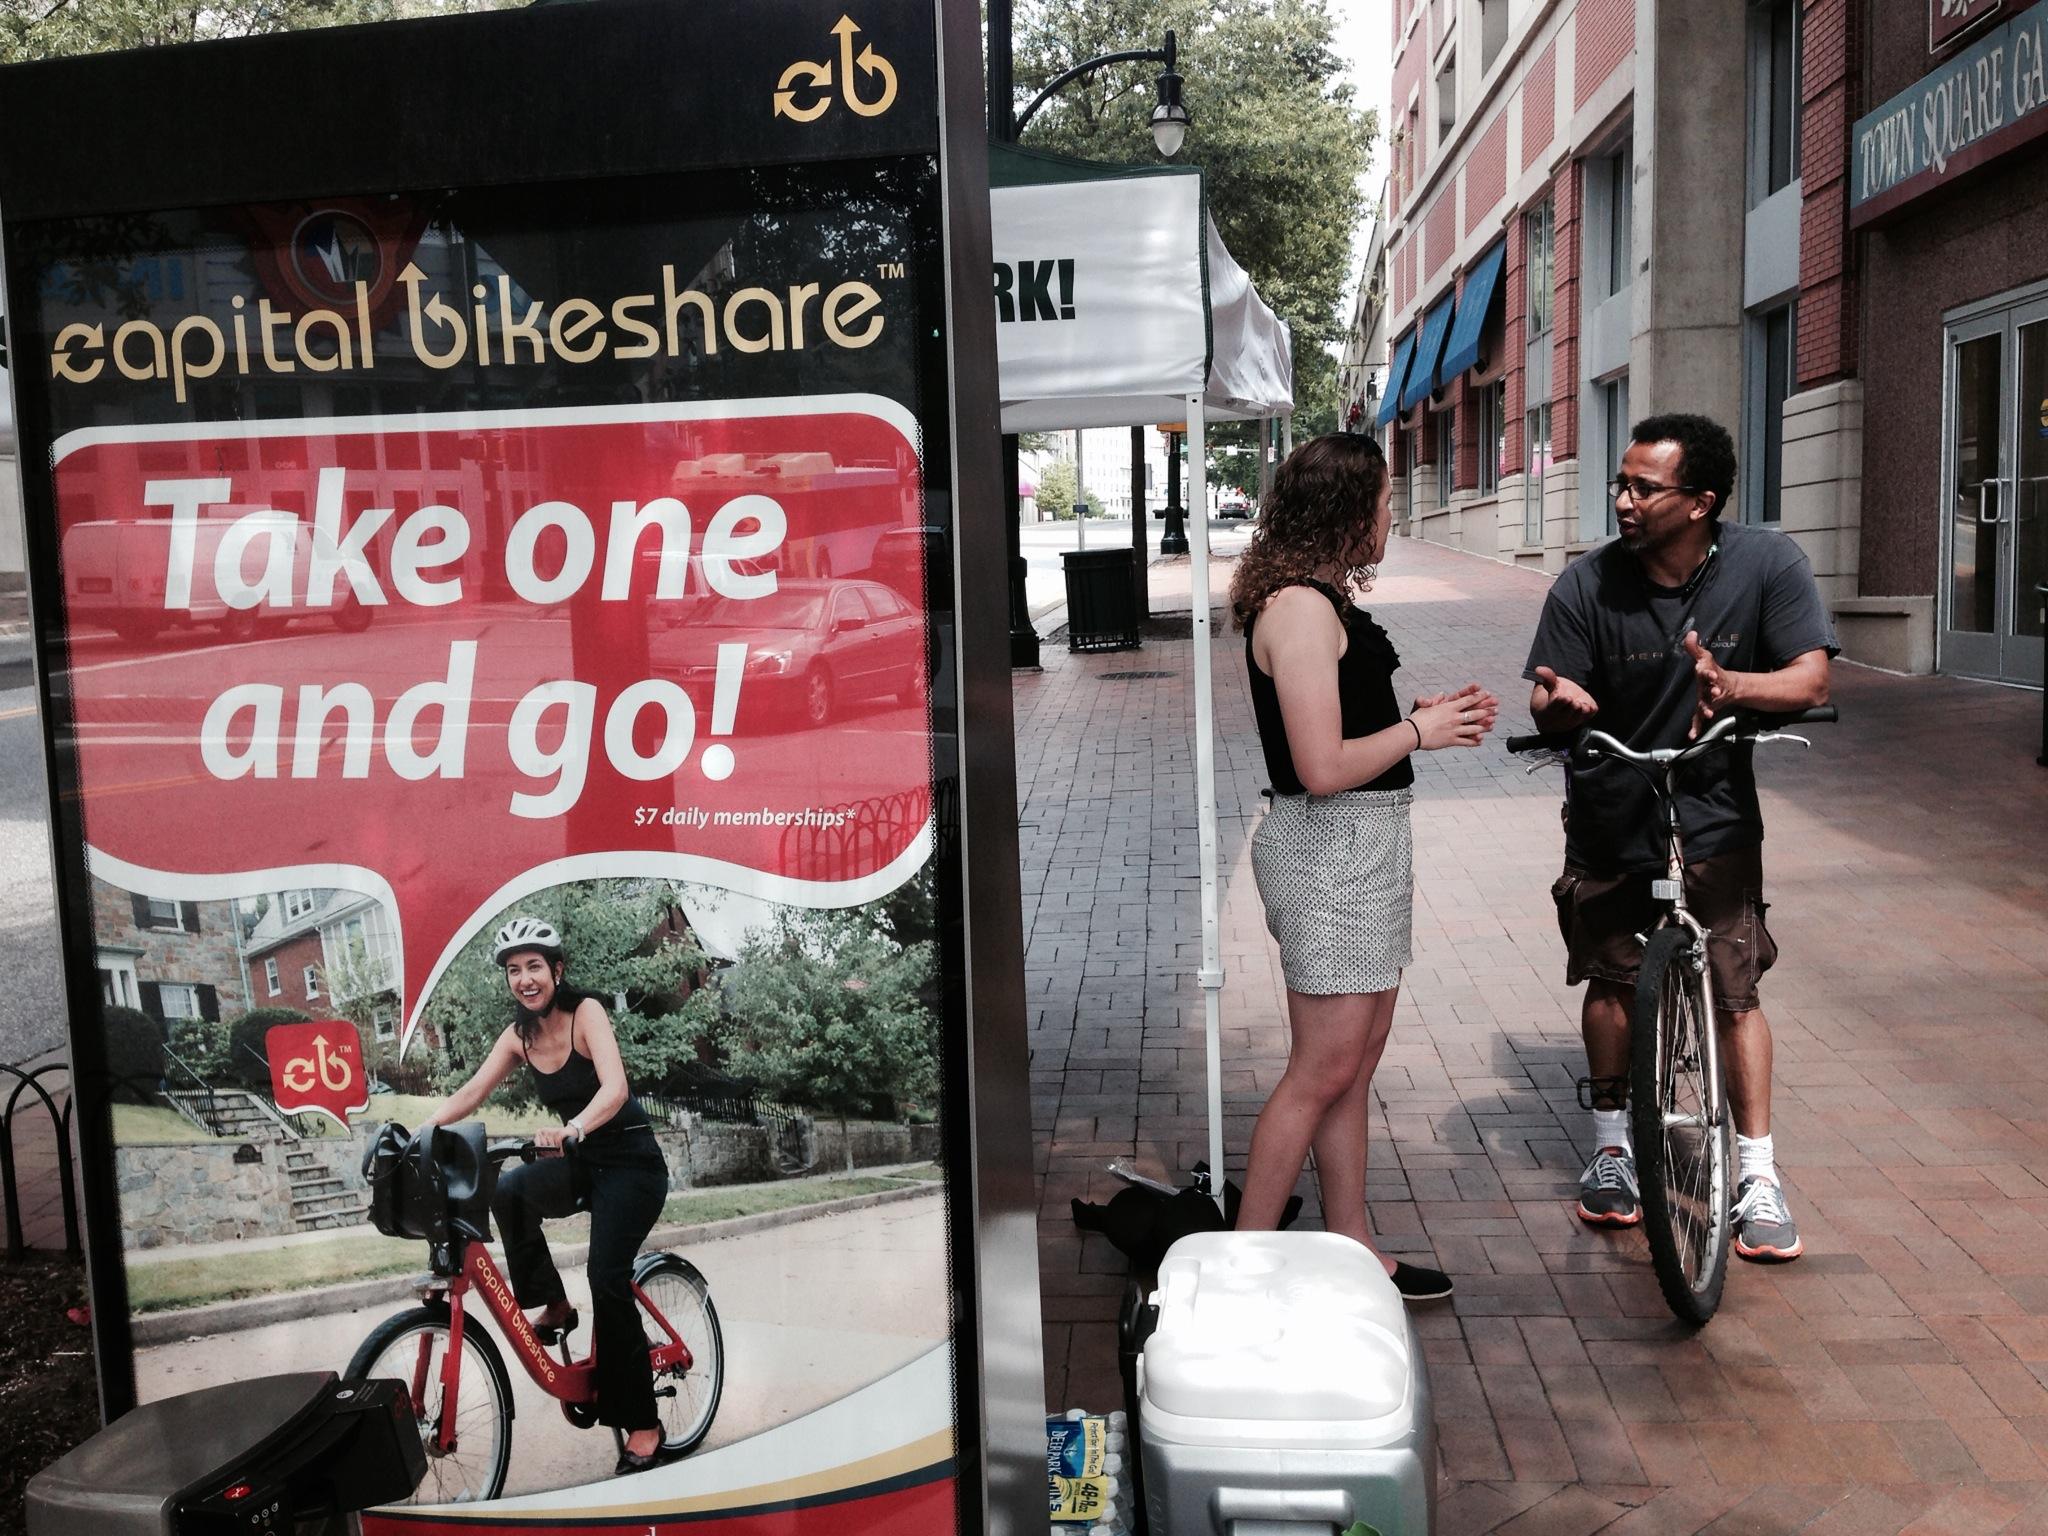 Capital Bikeshare runs out of keys as new membership soars